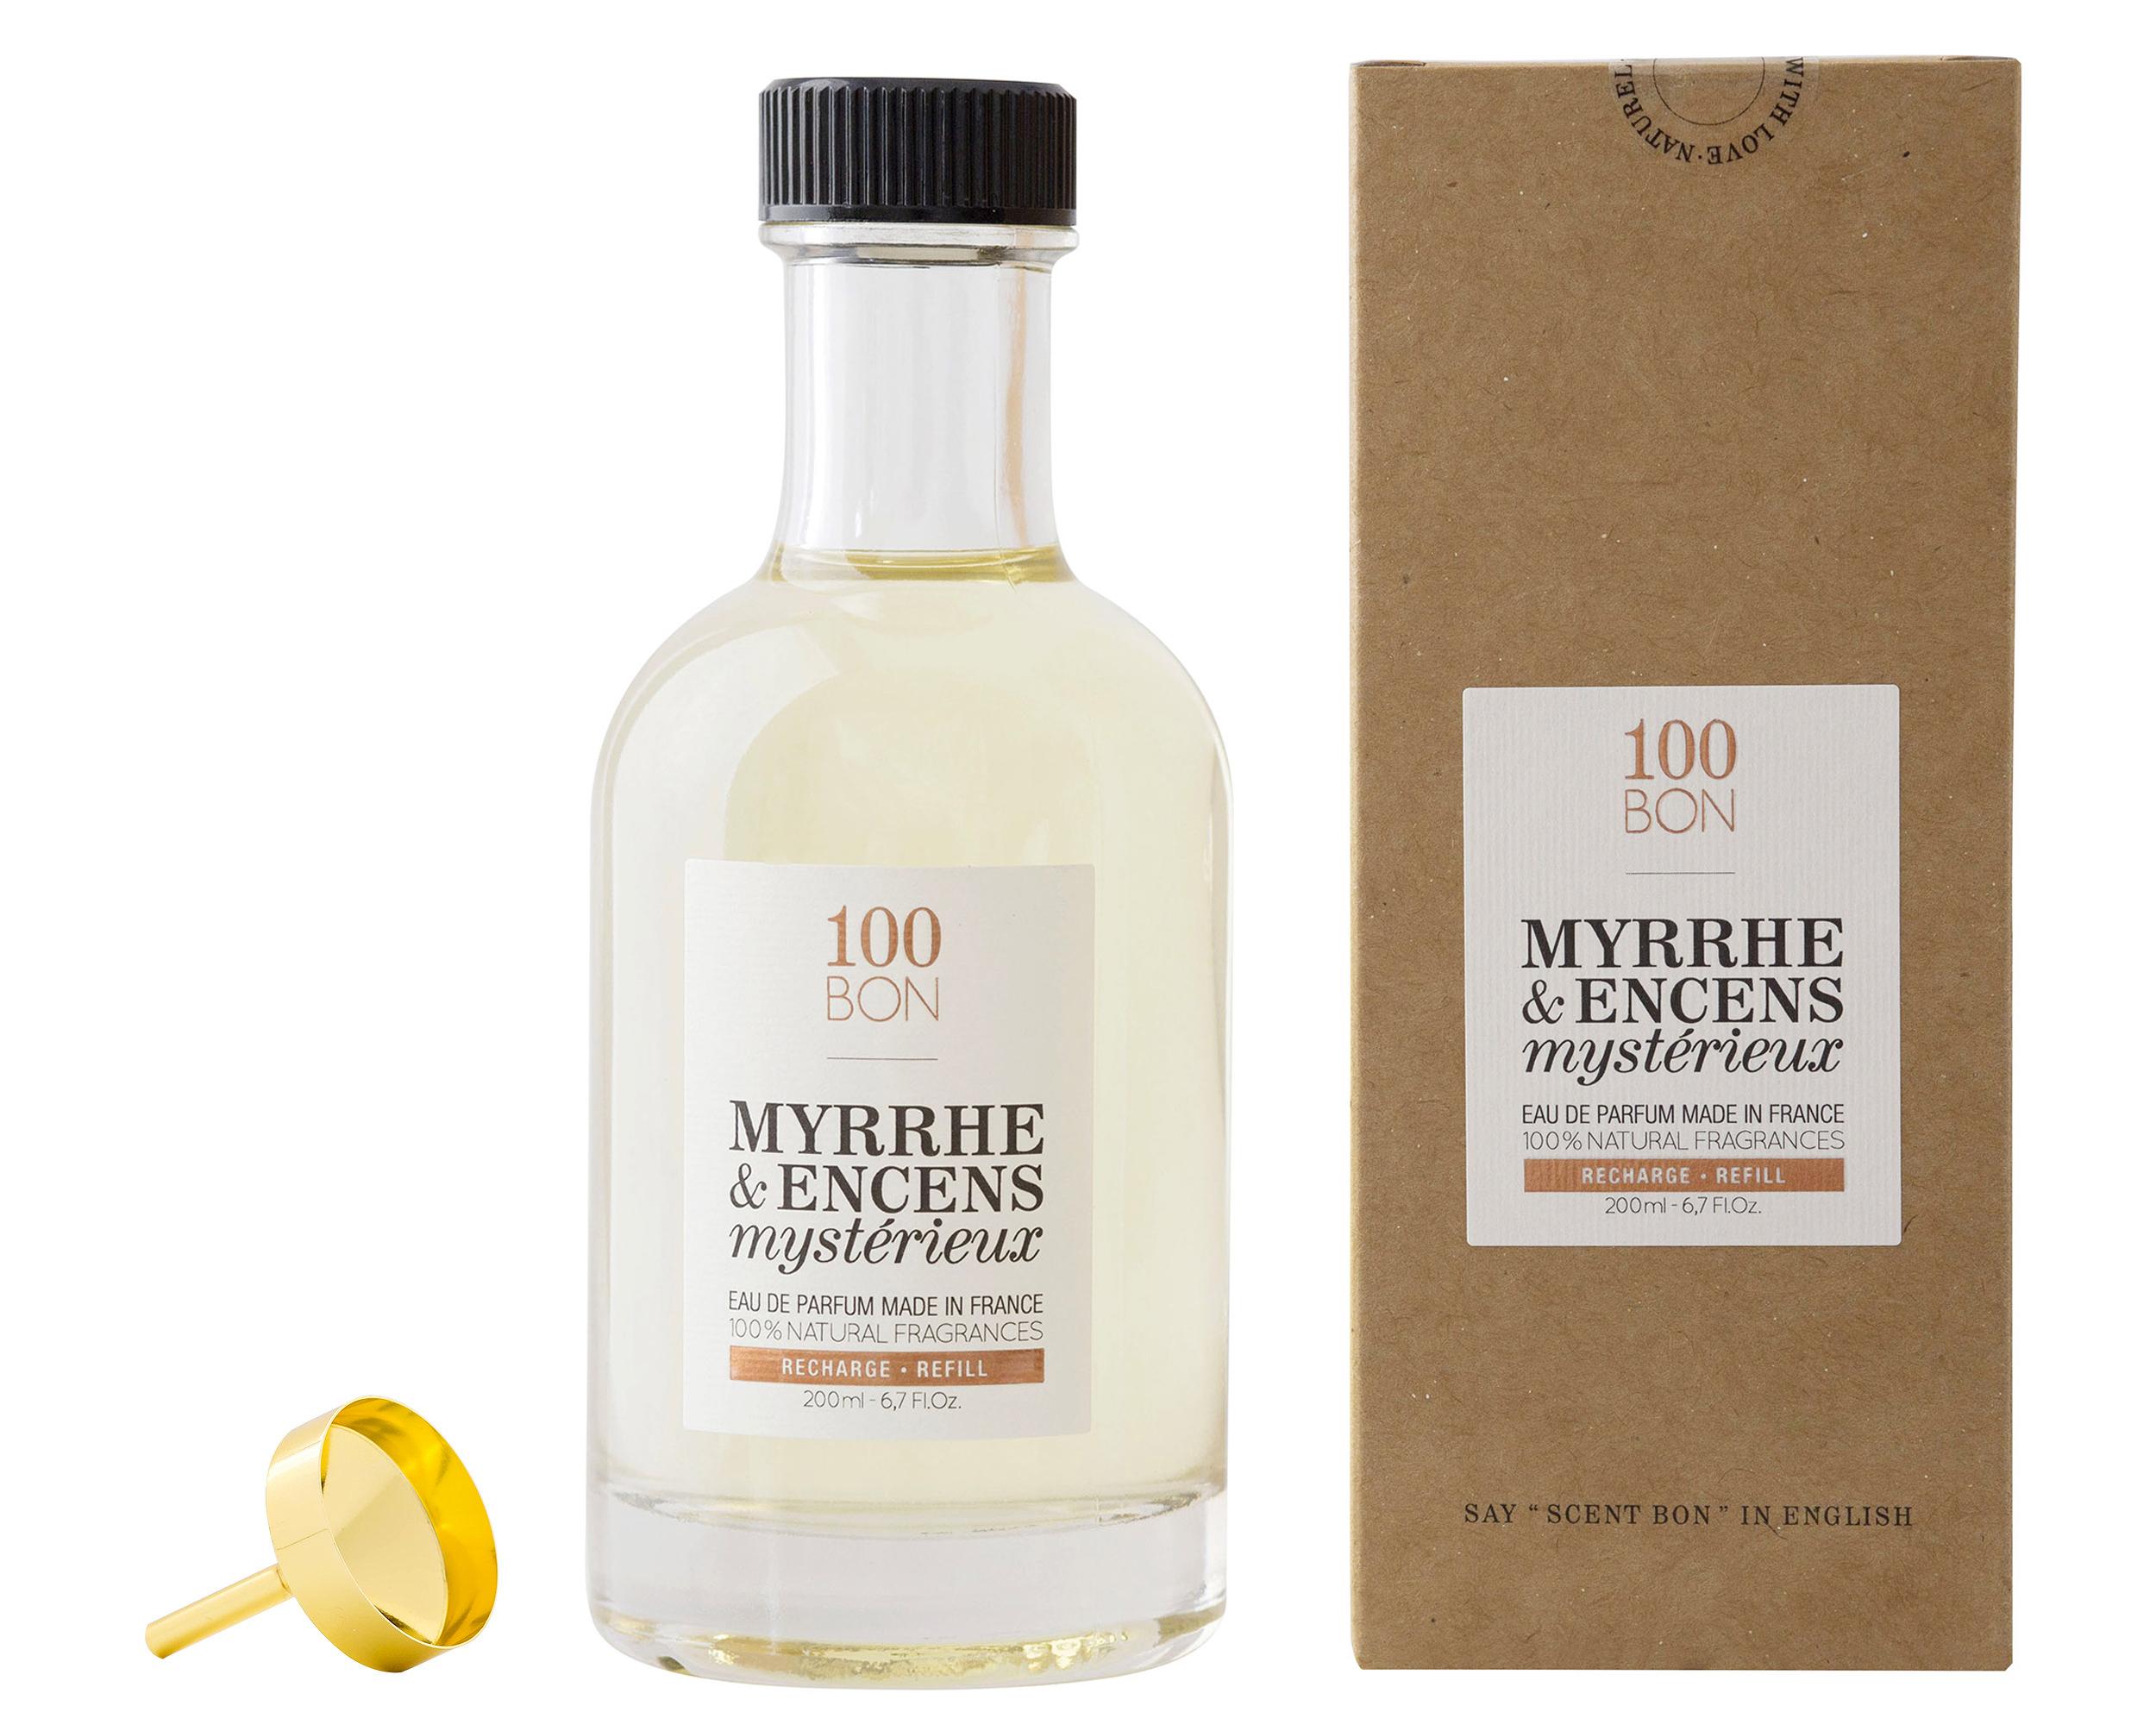 Myrrhe/Encens Mysterieux EdP 200ml